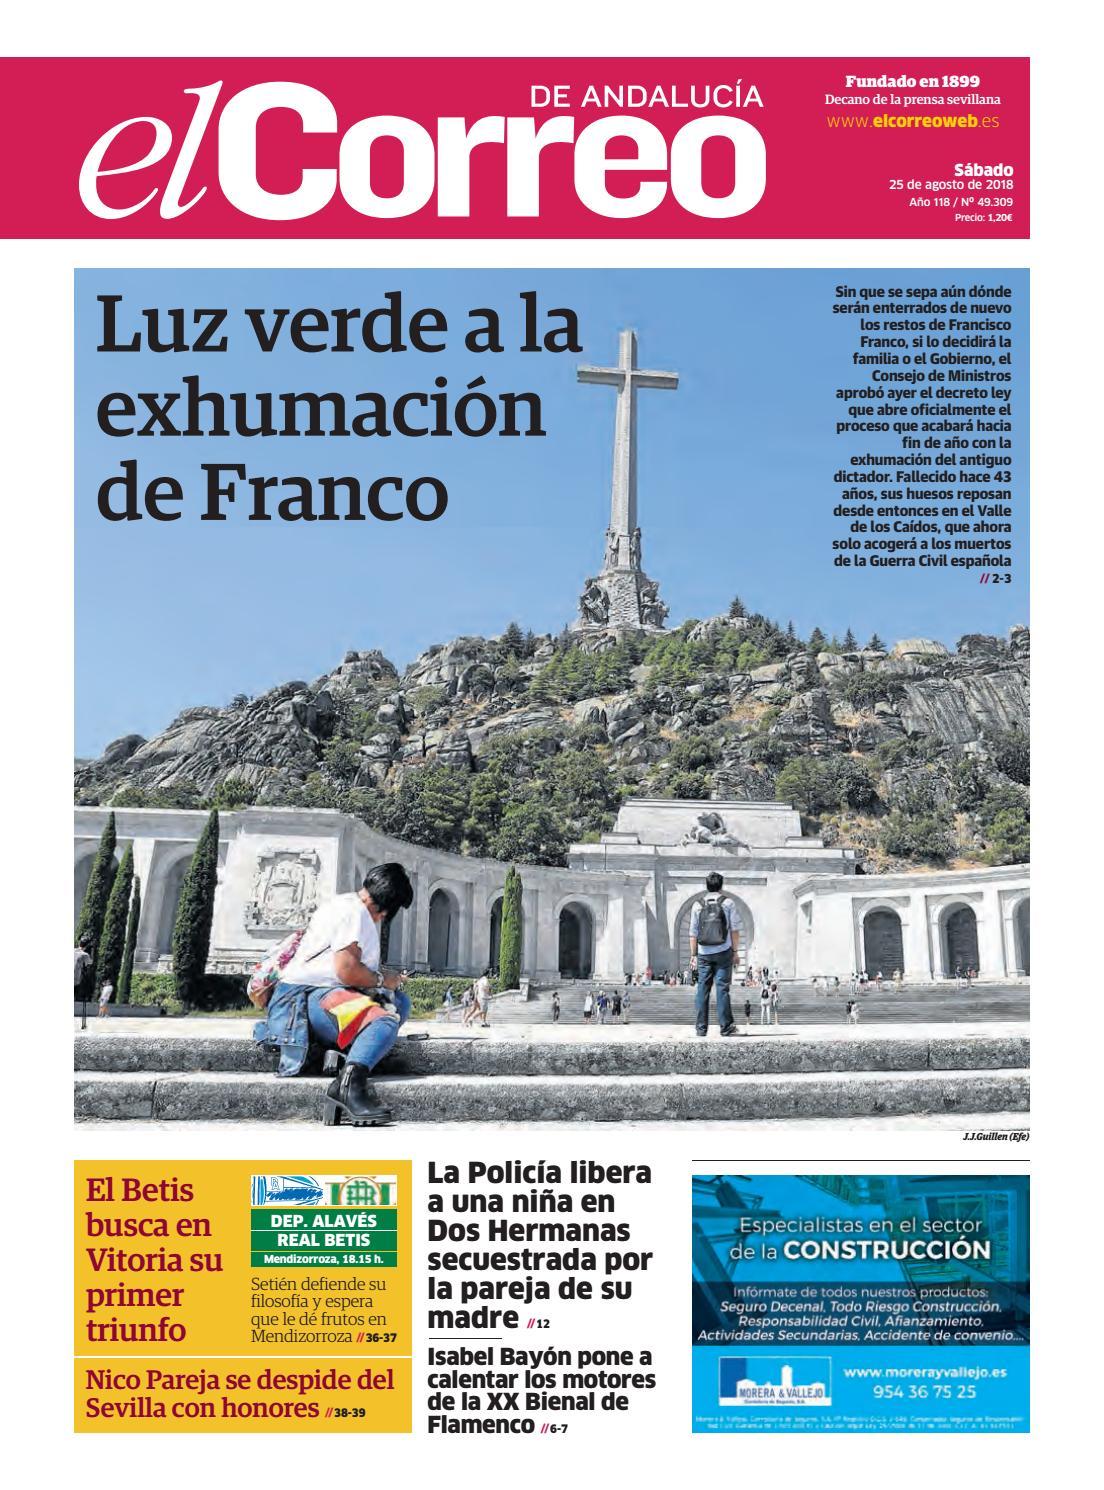 25.08.2018 El Correo de Andalucía. by EL CORREO DE ANDALUCÍA S.L. - issuu 4a66c951e81